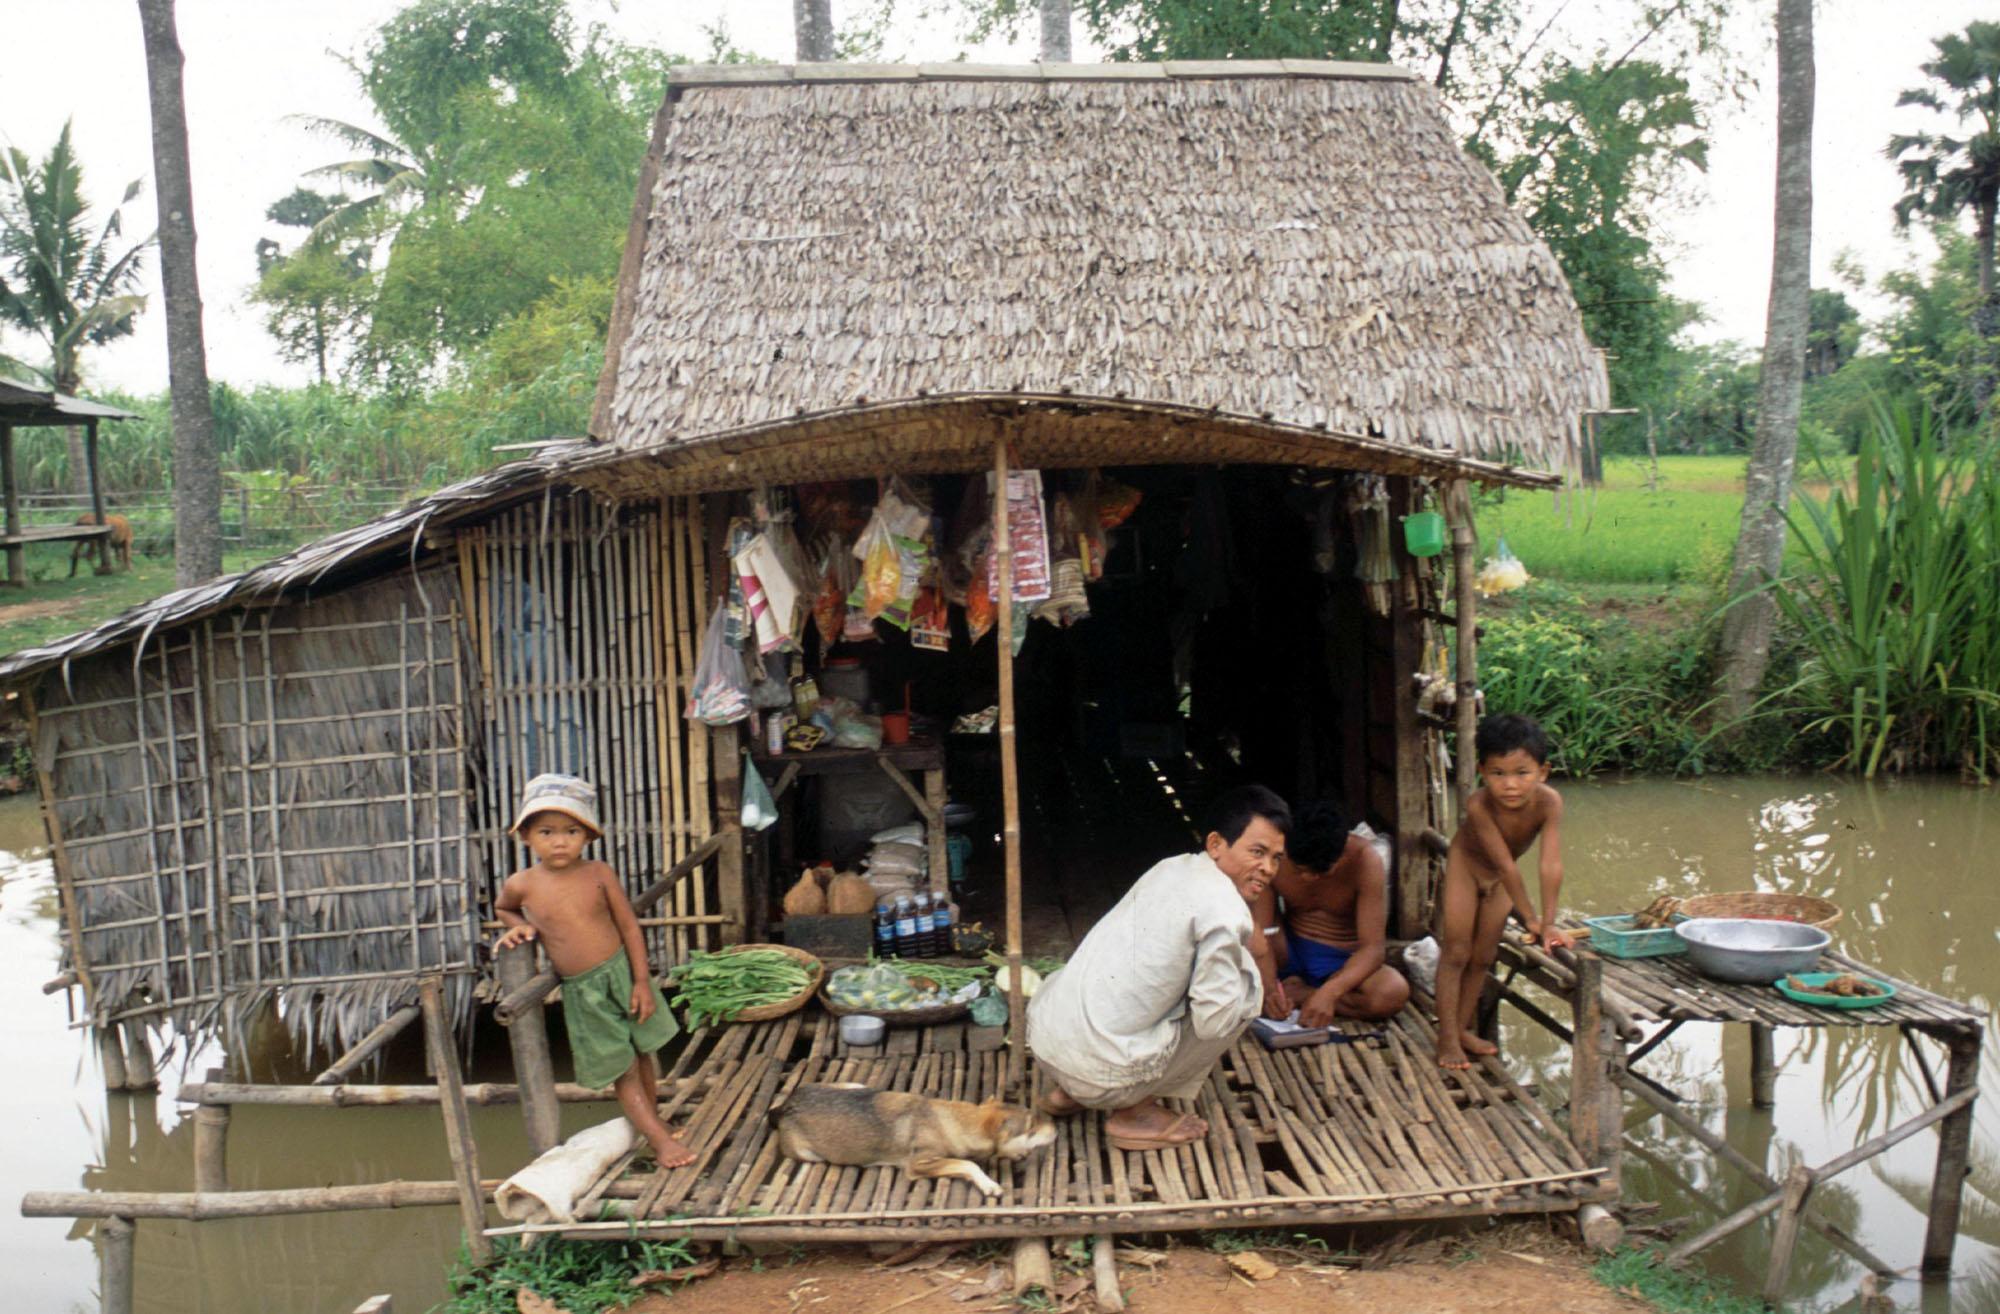 Minitour nei villaggi ed etnie del nord - da Luang Prabang